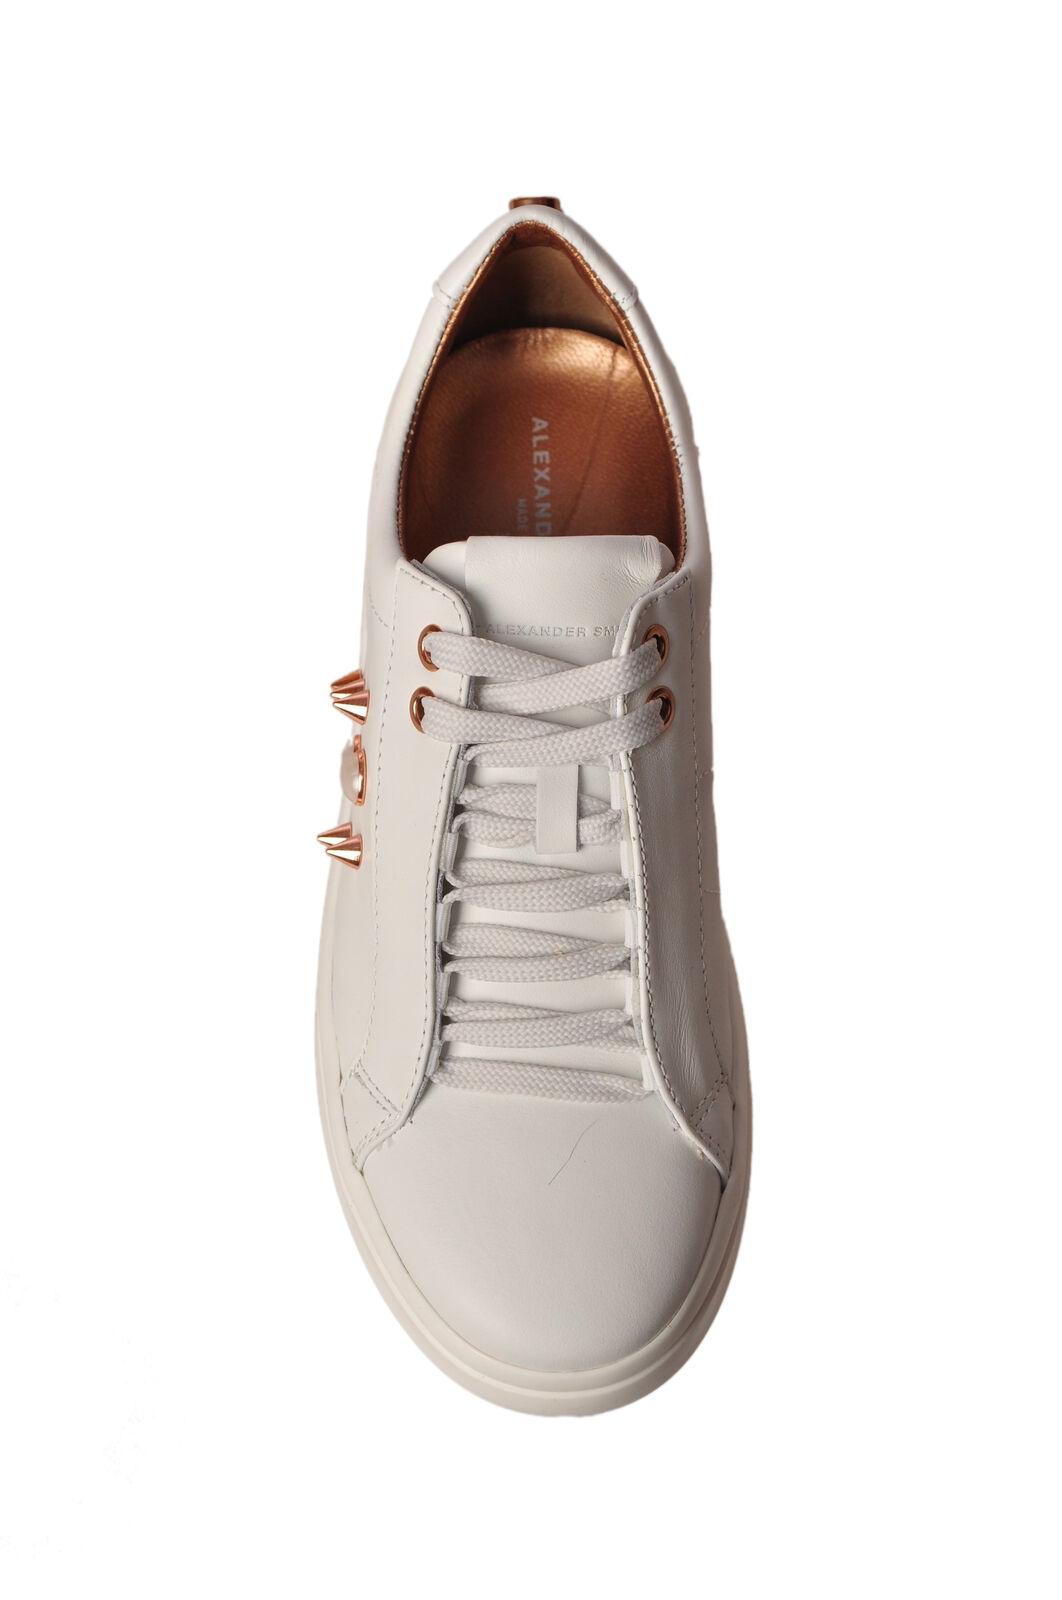 Alexander Smith - Schuhe-Turnschuhe-niedrige - Frau - Weiß Weiß Weiß - 5030608E184301 d74dfd